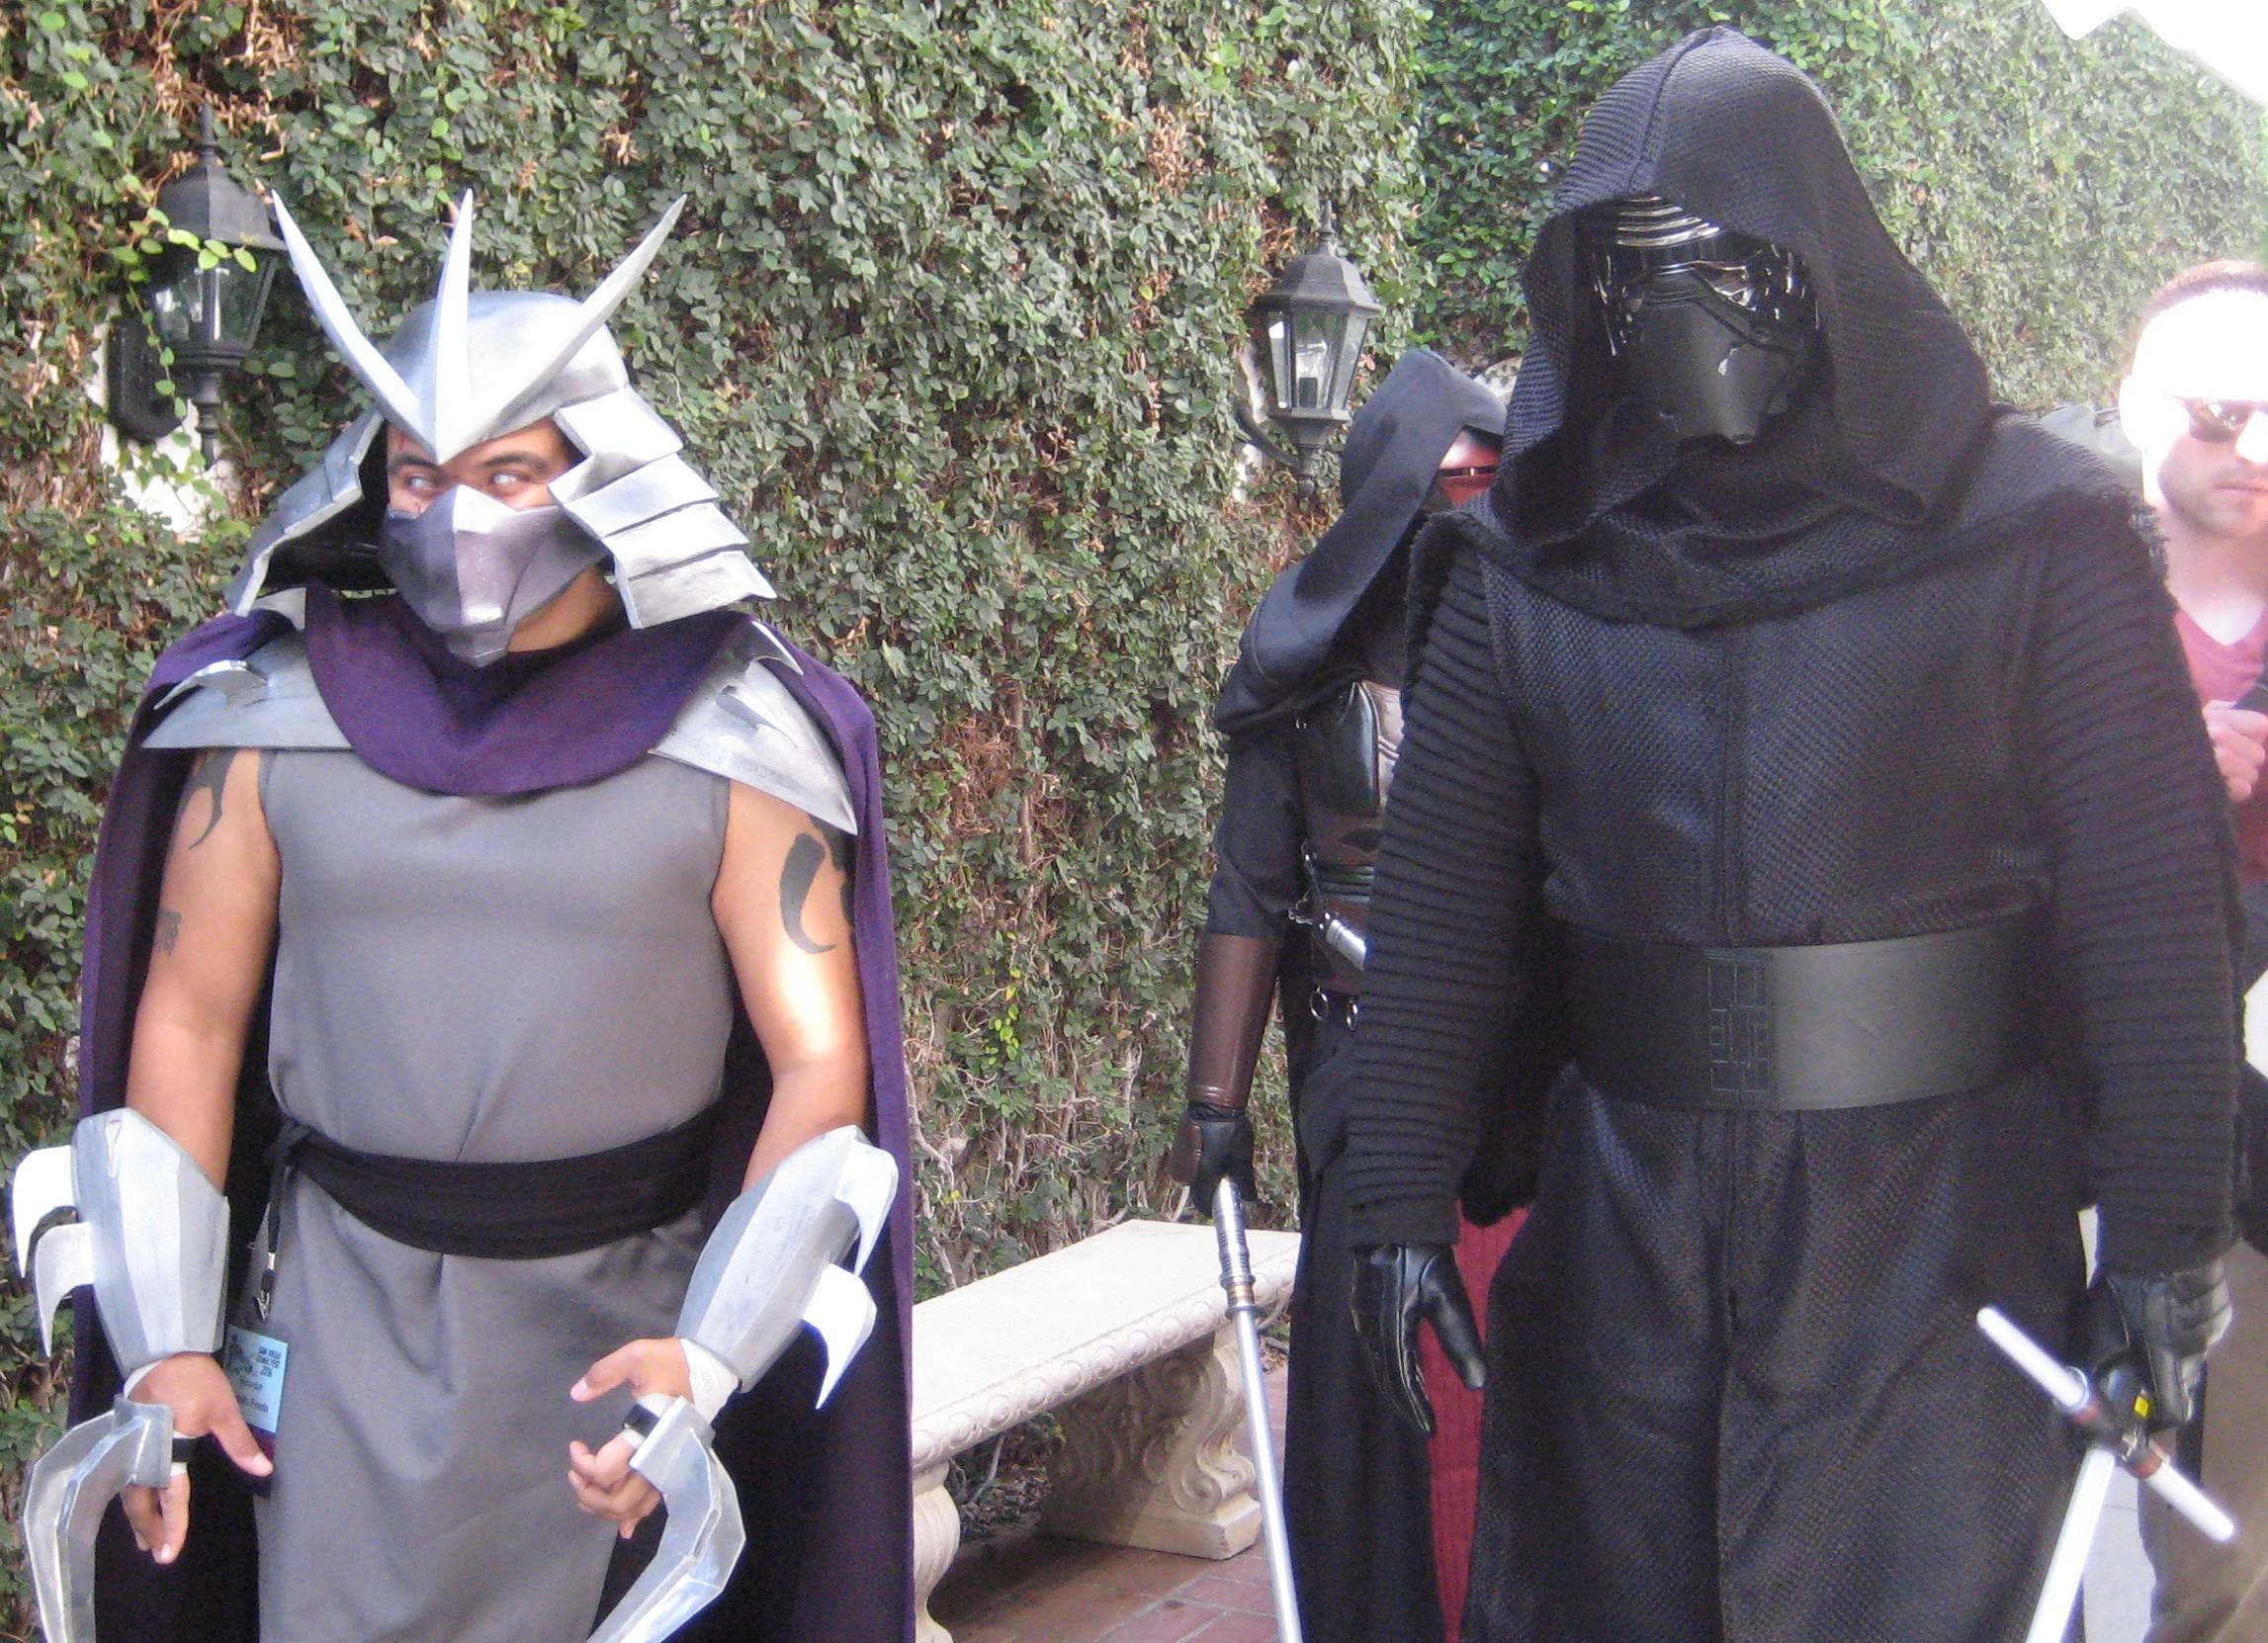 Shredder from Teenage Mutant Ninja Turtles and #Kylo Ren from #Star Wars